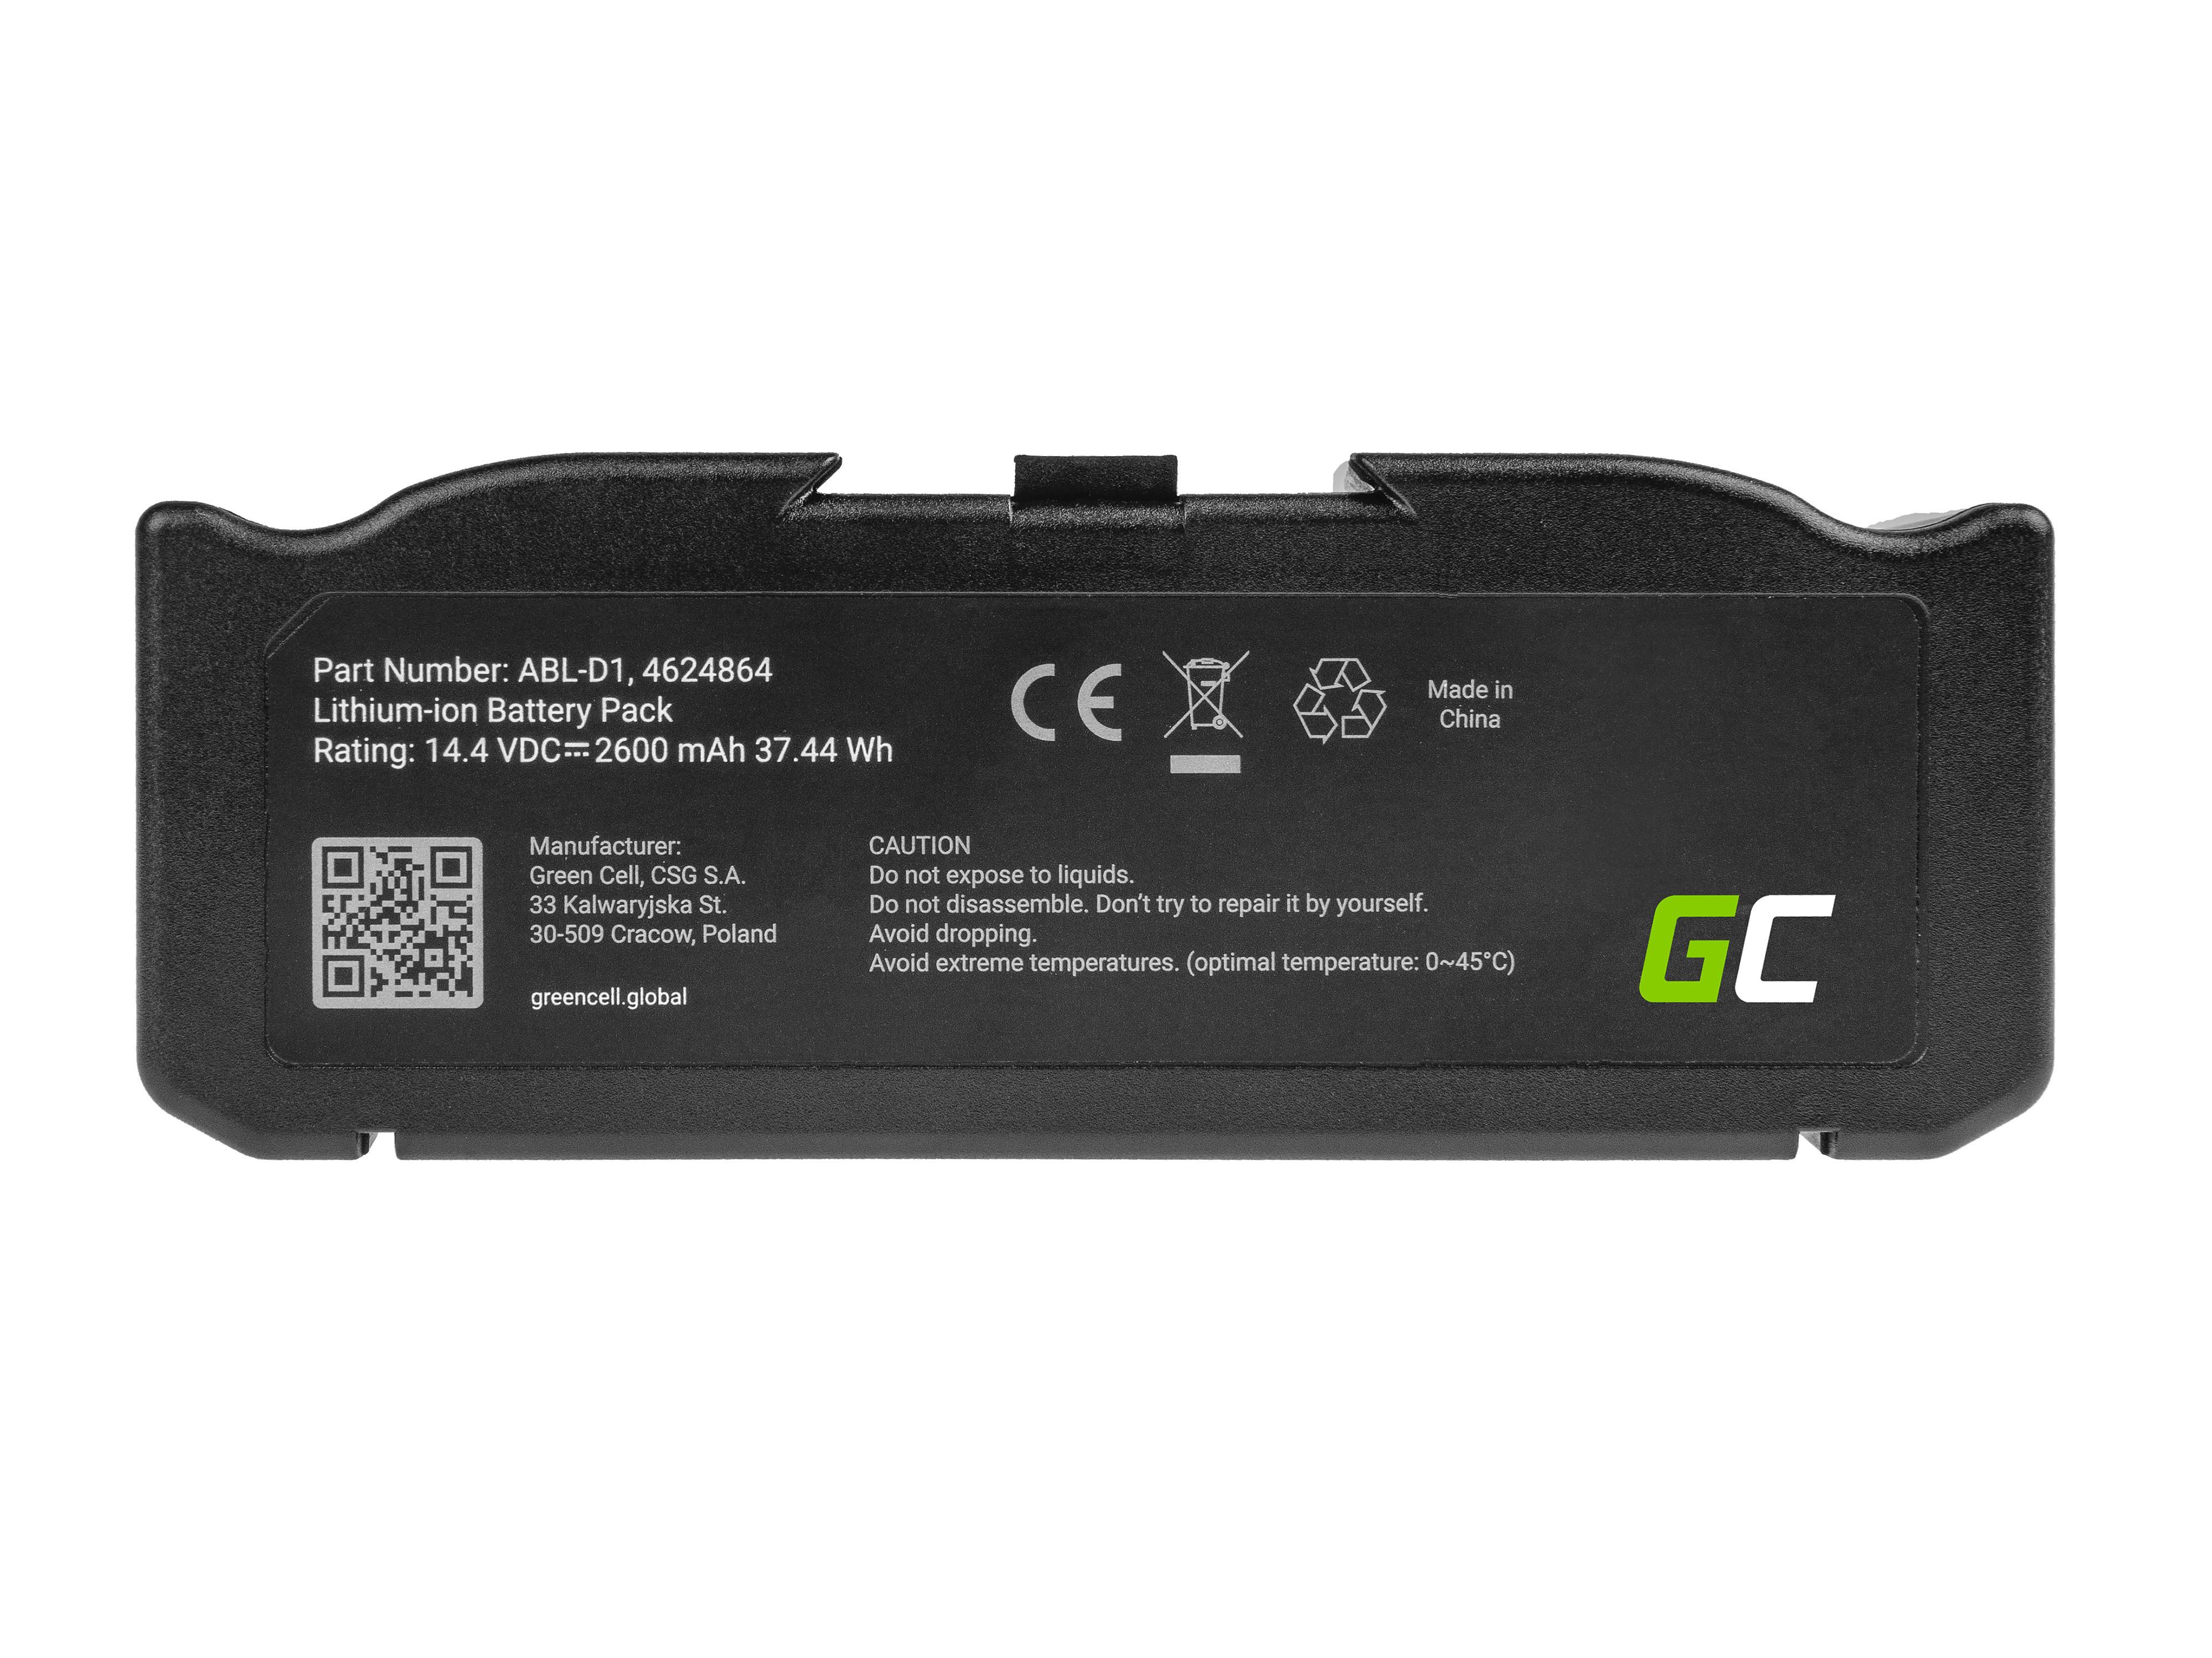 Green Cell PT258 Baterie iRobot ABL-D1, 4624864, iRobot Roomba e5, e6, i3, i3+, i7, i7+, i8, i8+ 14.4V 2600mAh Li-ion - neoriginální